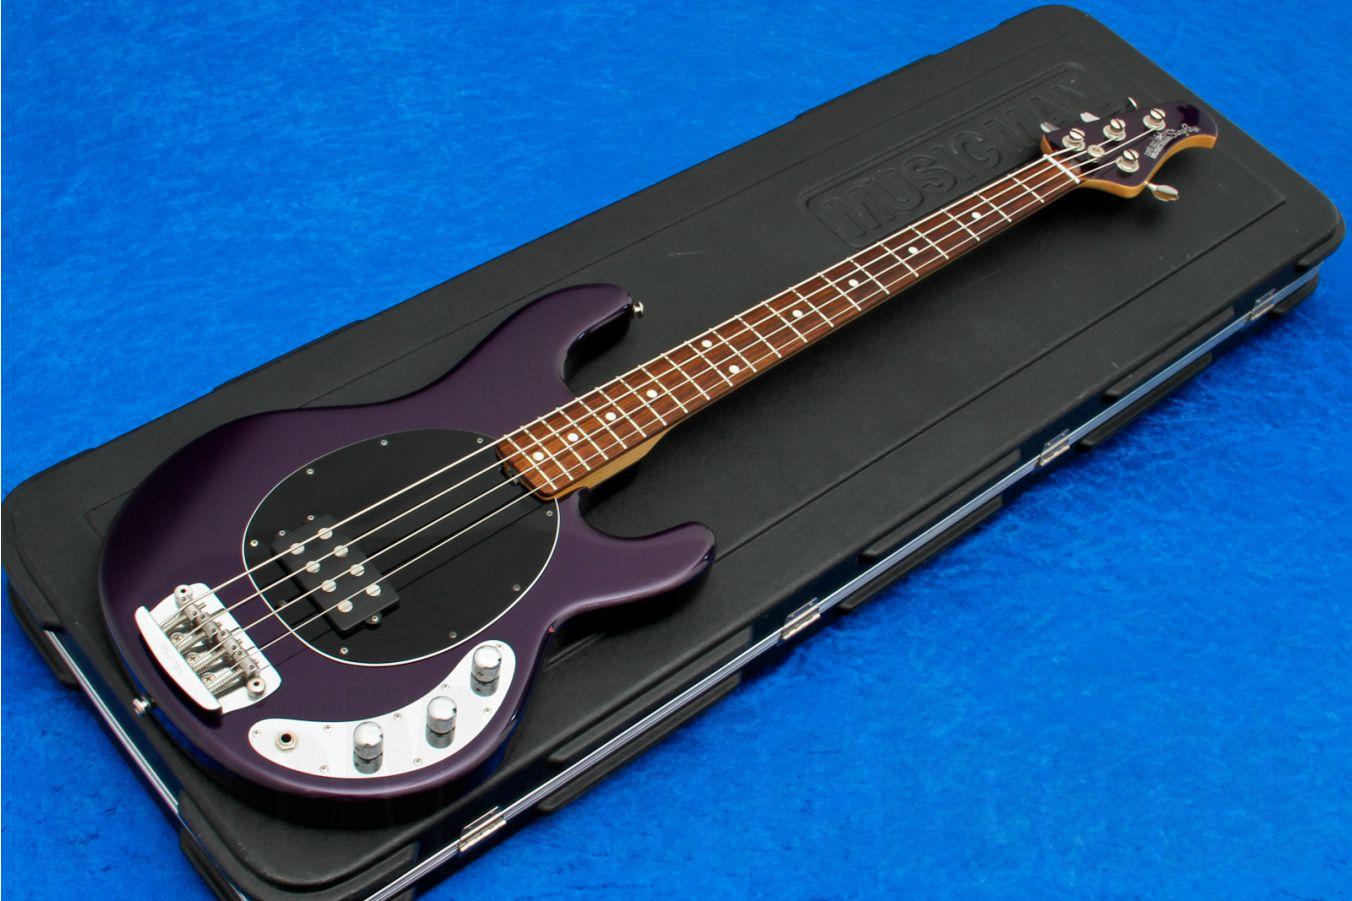 Music Man USA Stingray 4 2EQ PP - Pearl Purple RW MH Limited Edition